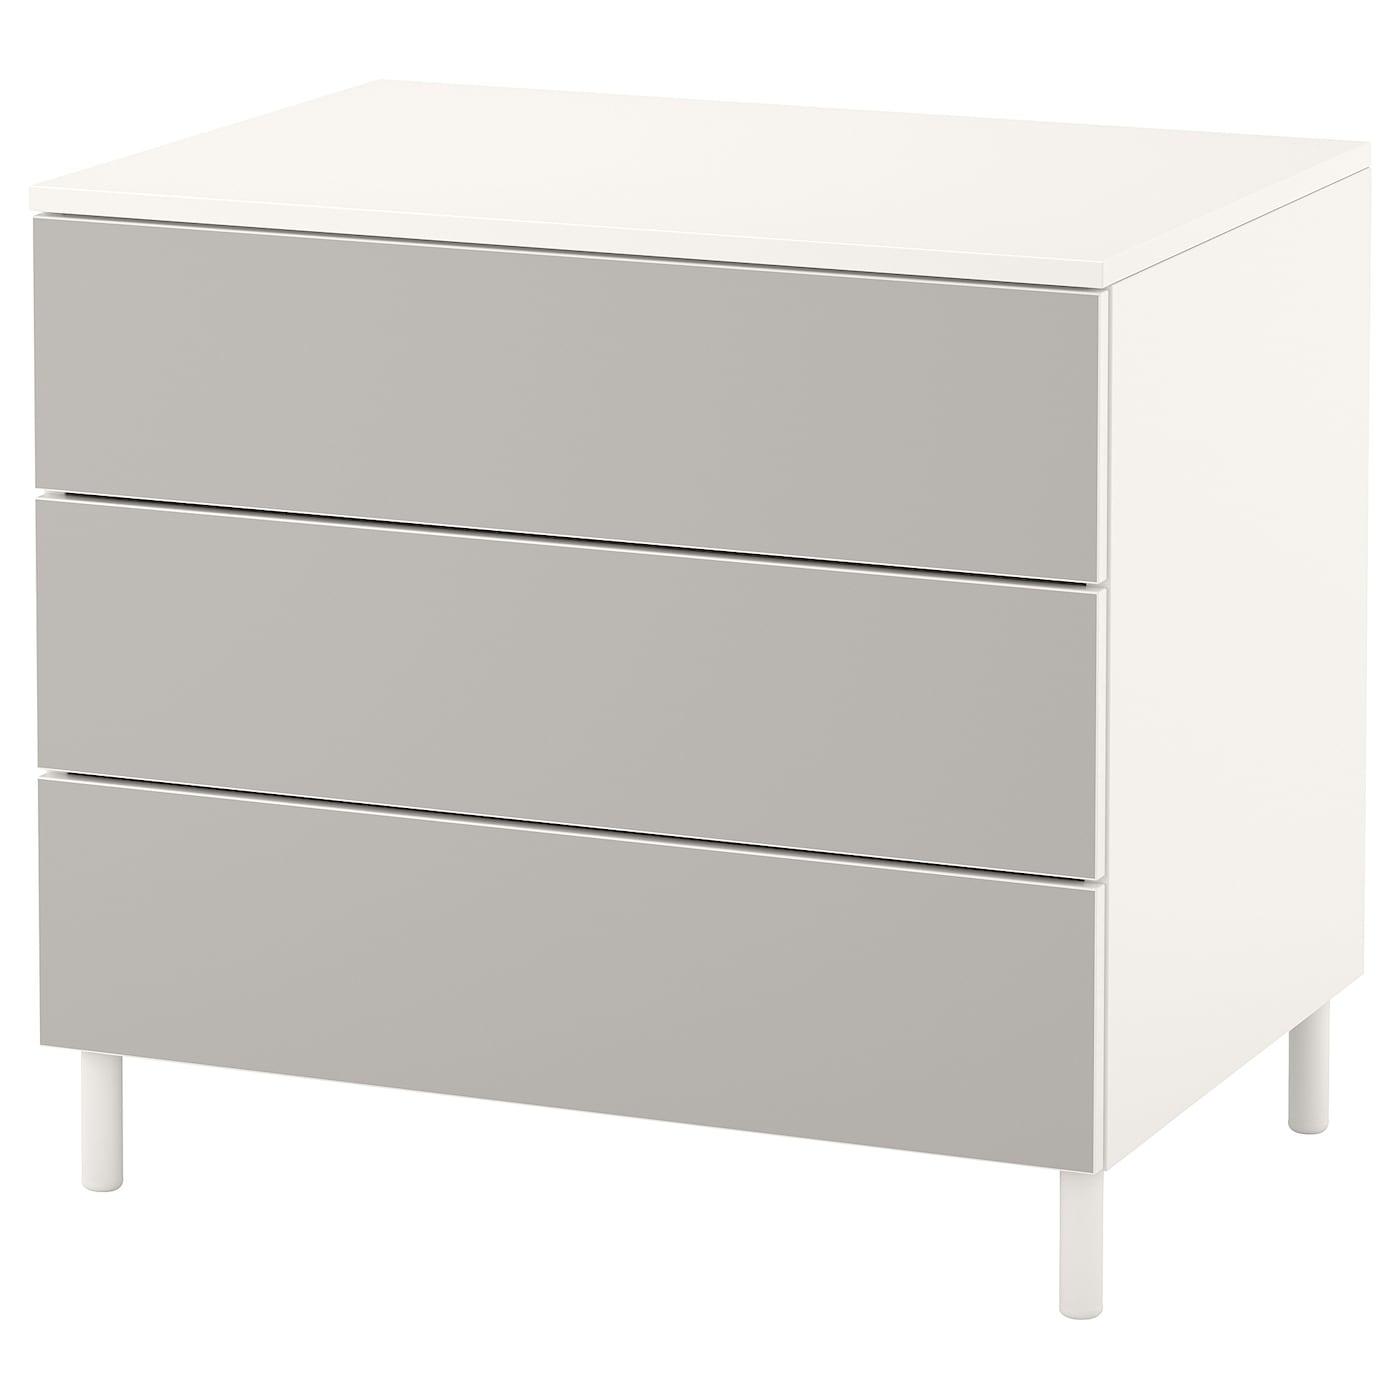 Chest Of 3 Drawers Platsa White Skatval Light Grey